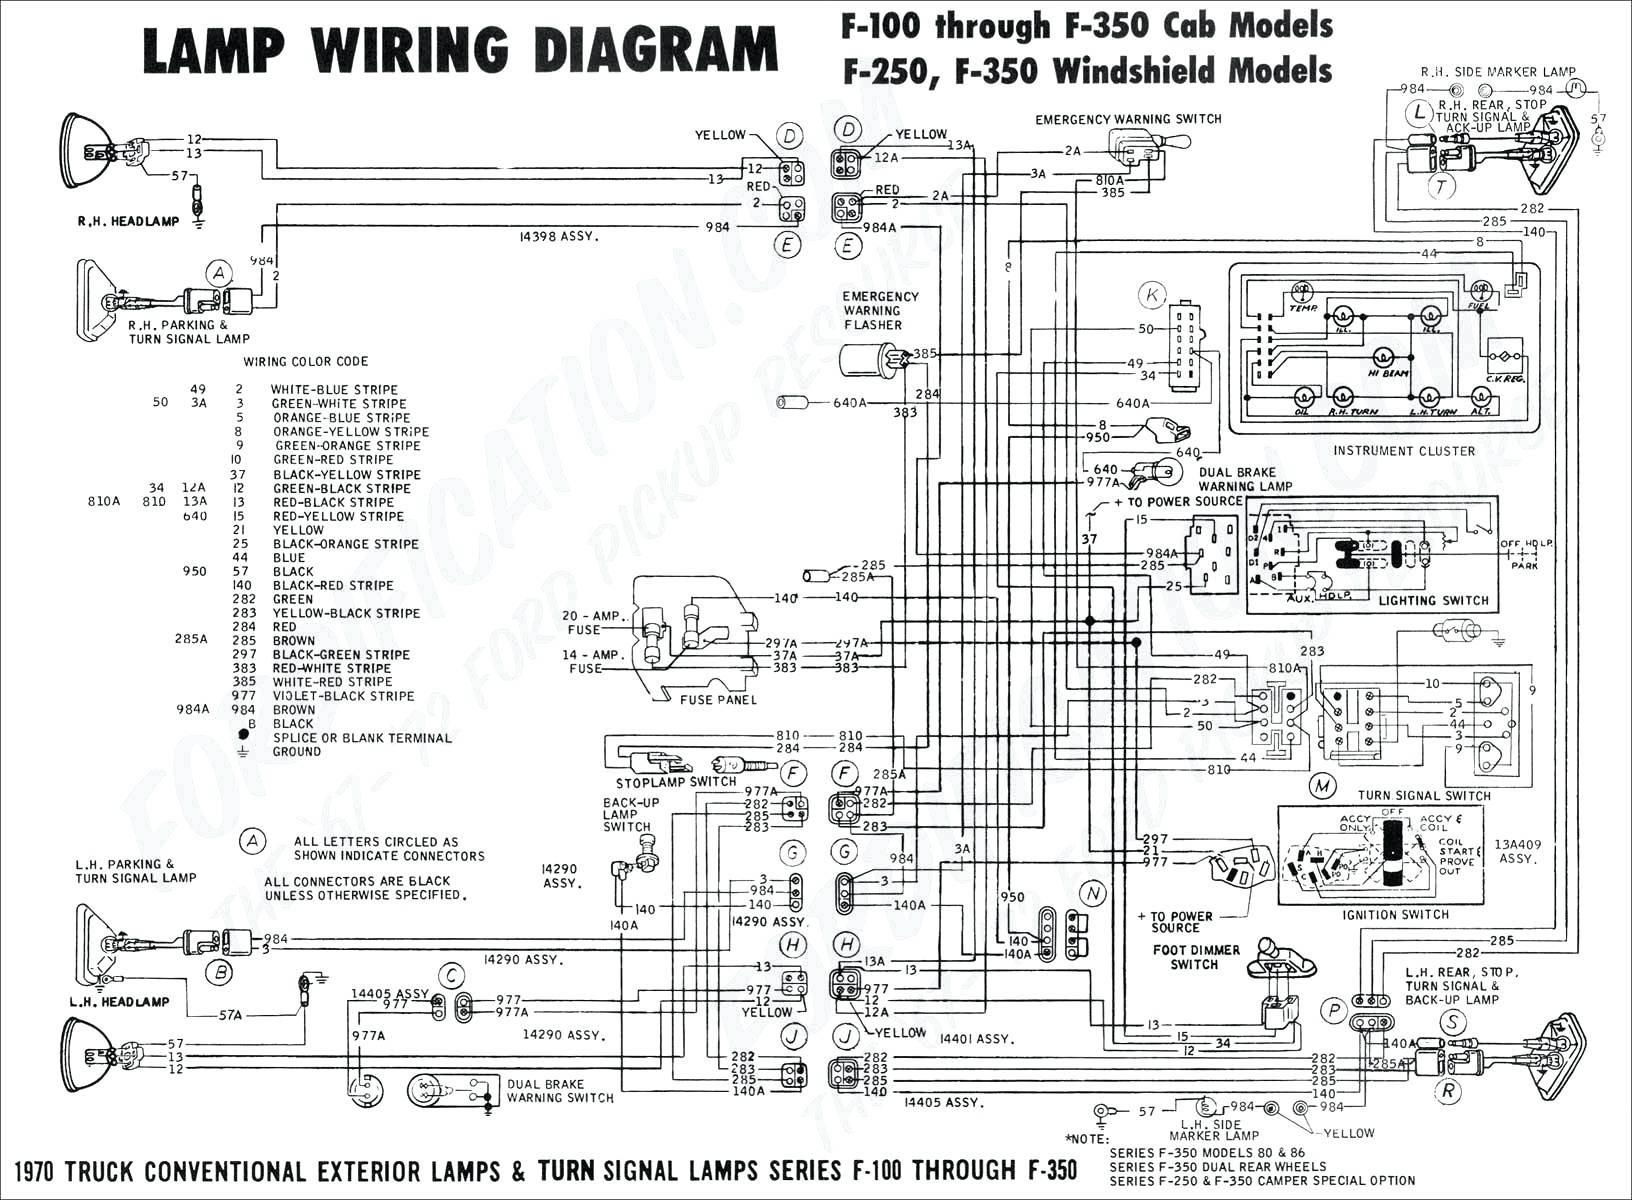 hight resolution of wrg 7265 f 150 pickup wiring schematic1986 toyota pickup wiring diagram f150 trailer wiring diagram